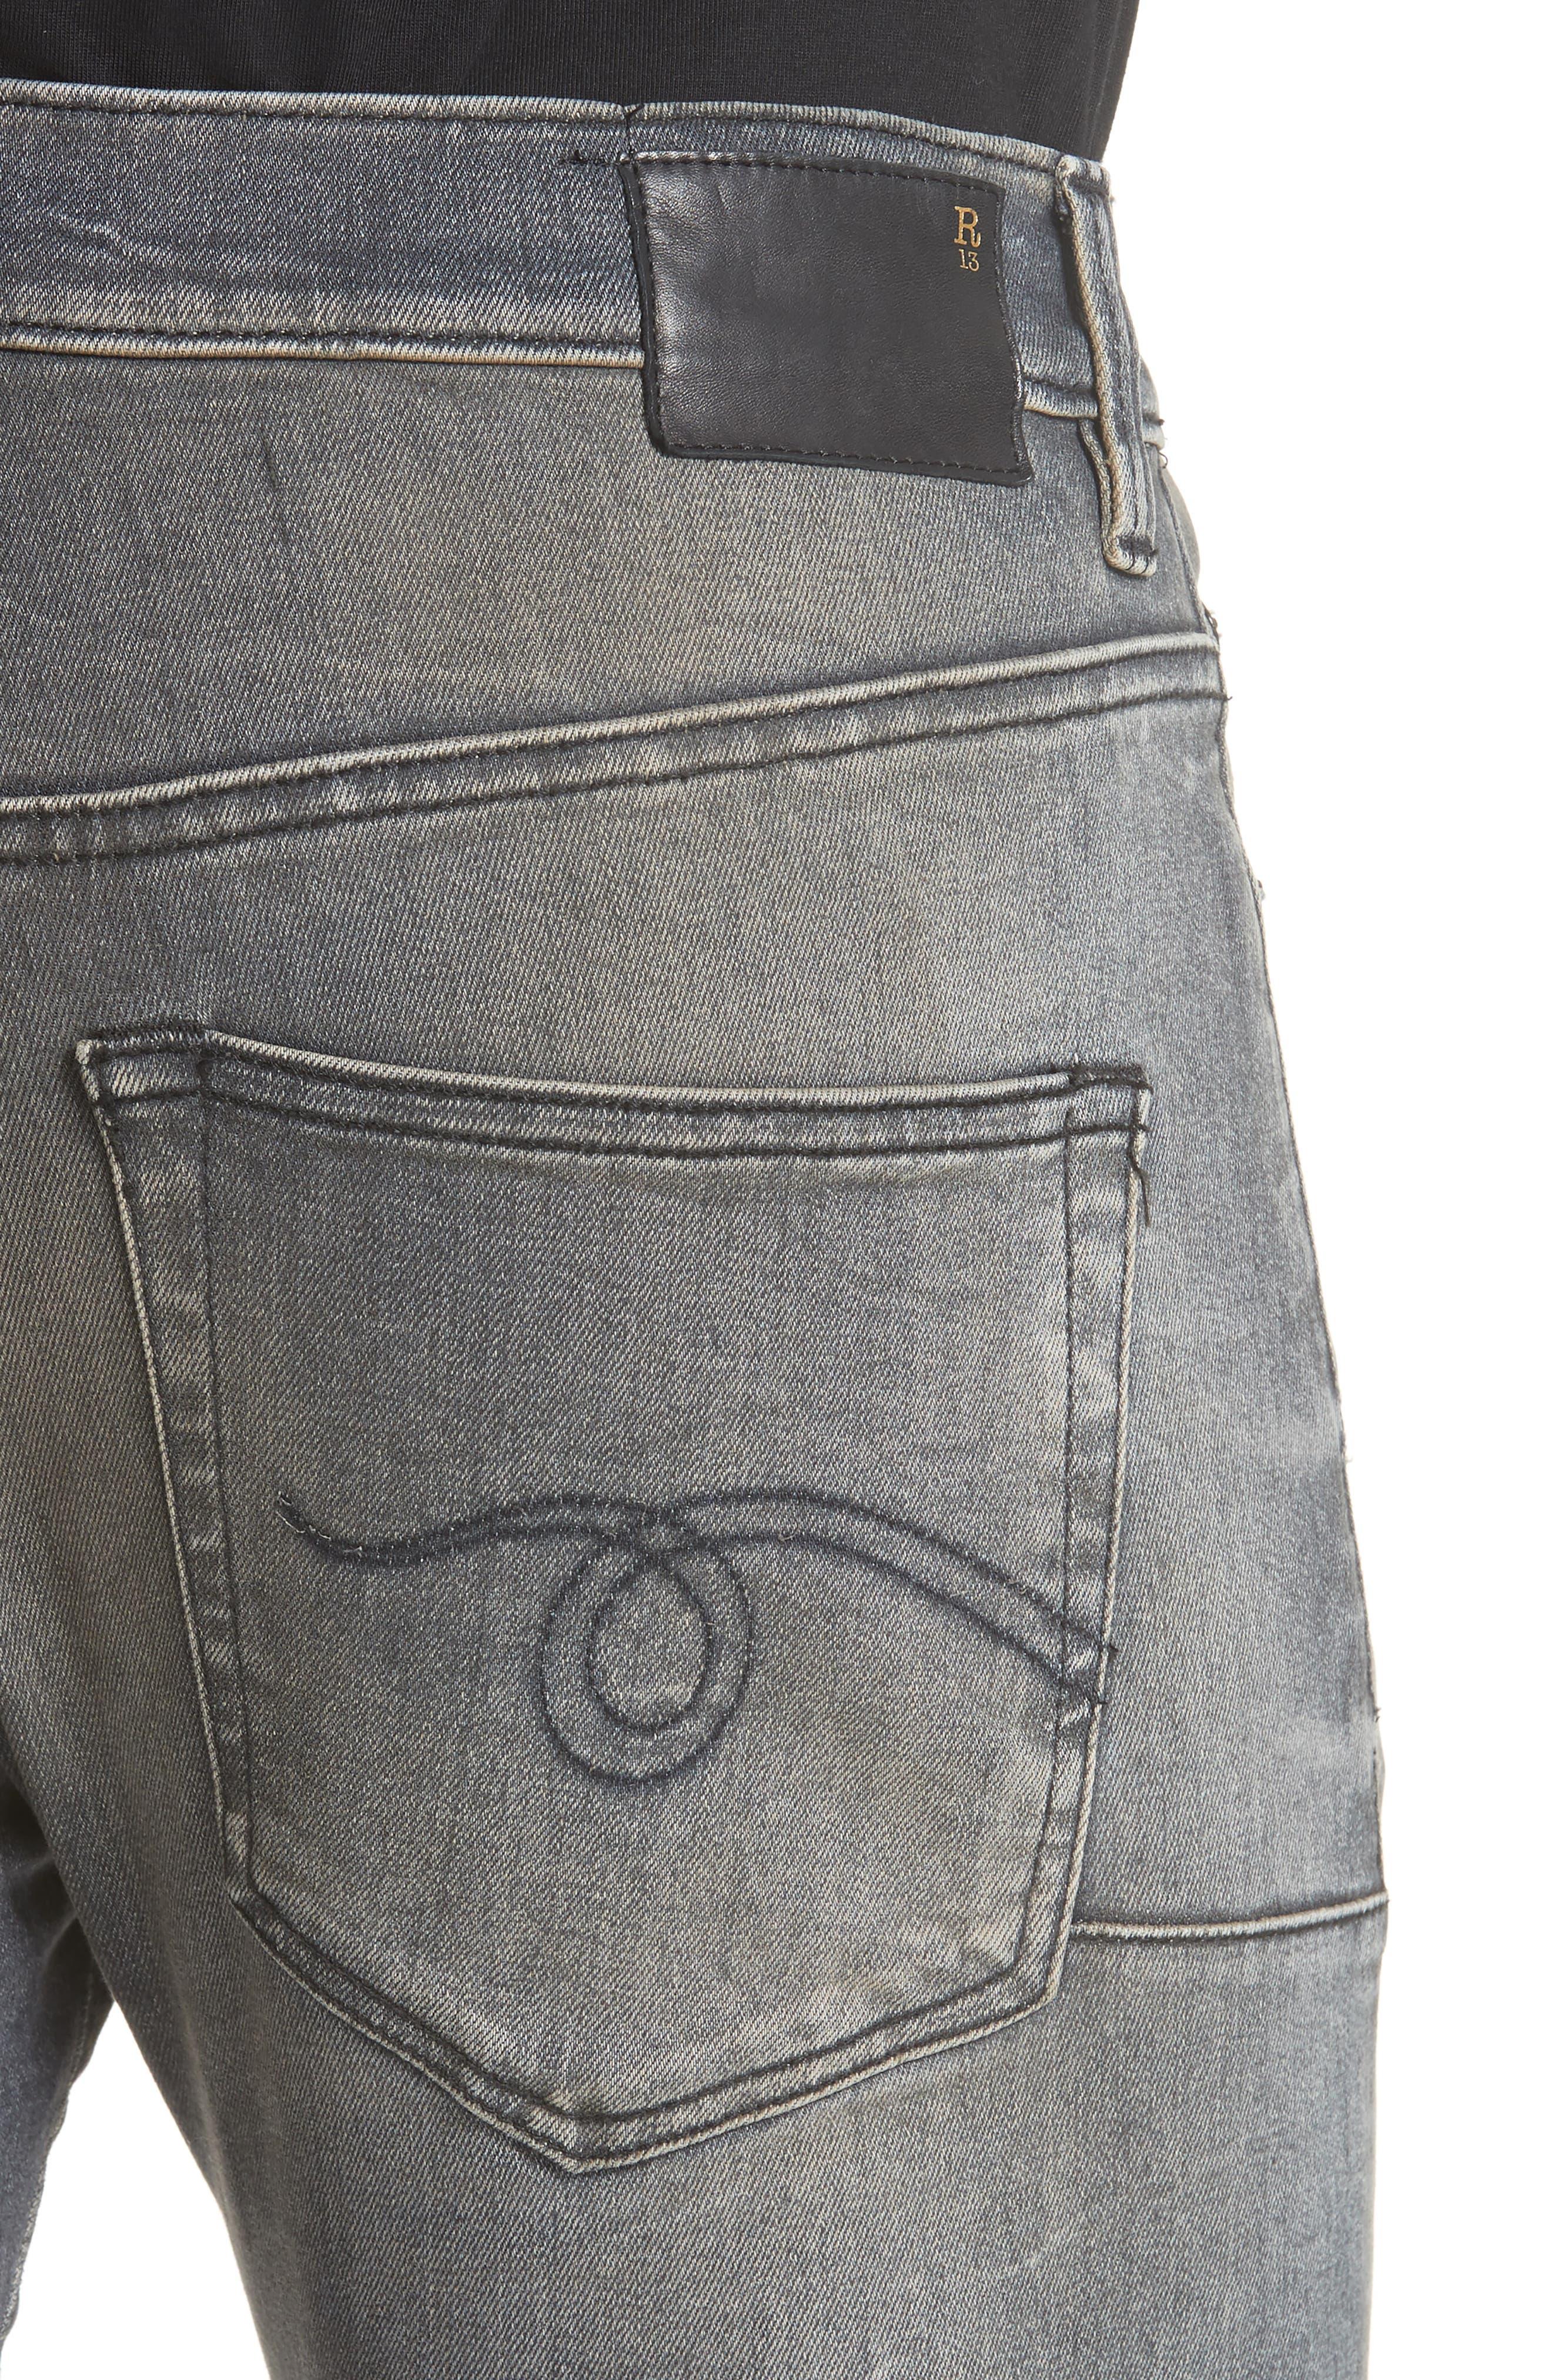 Skate Slim Fit Jeans,                             Alternate thumbnail 4, color,                             001